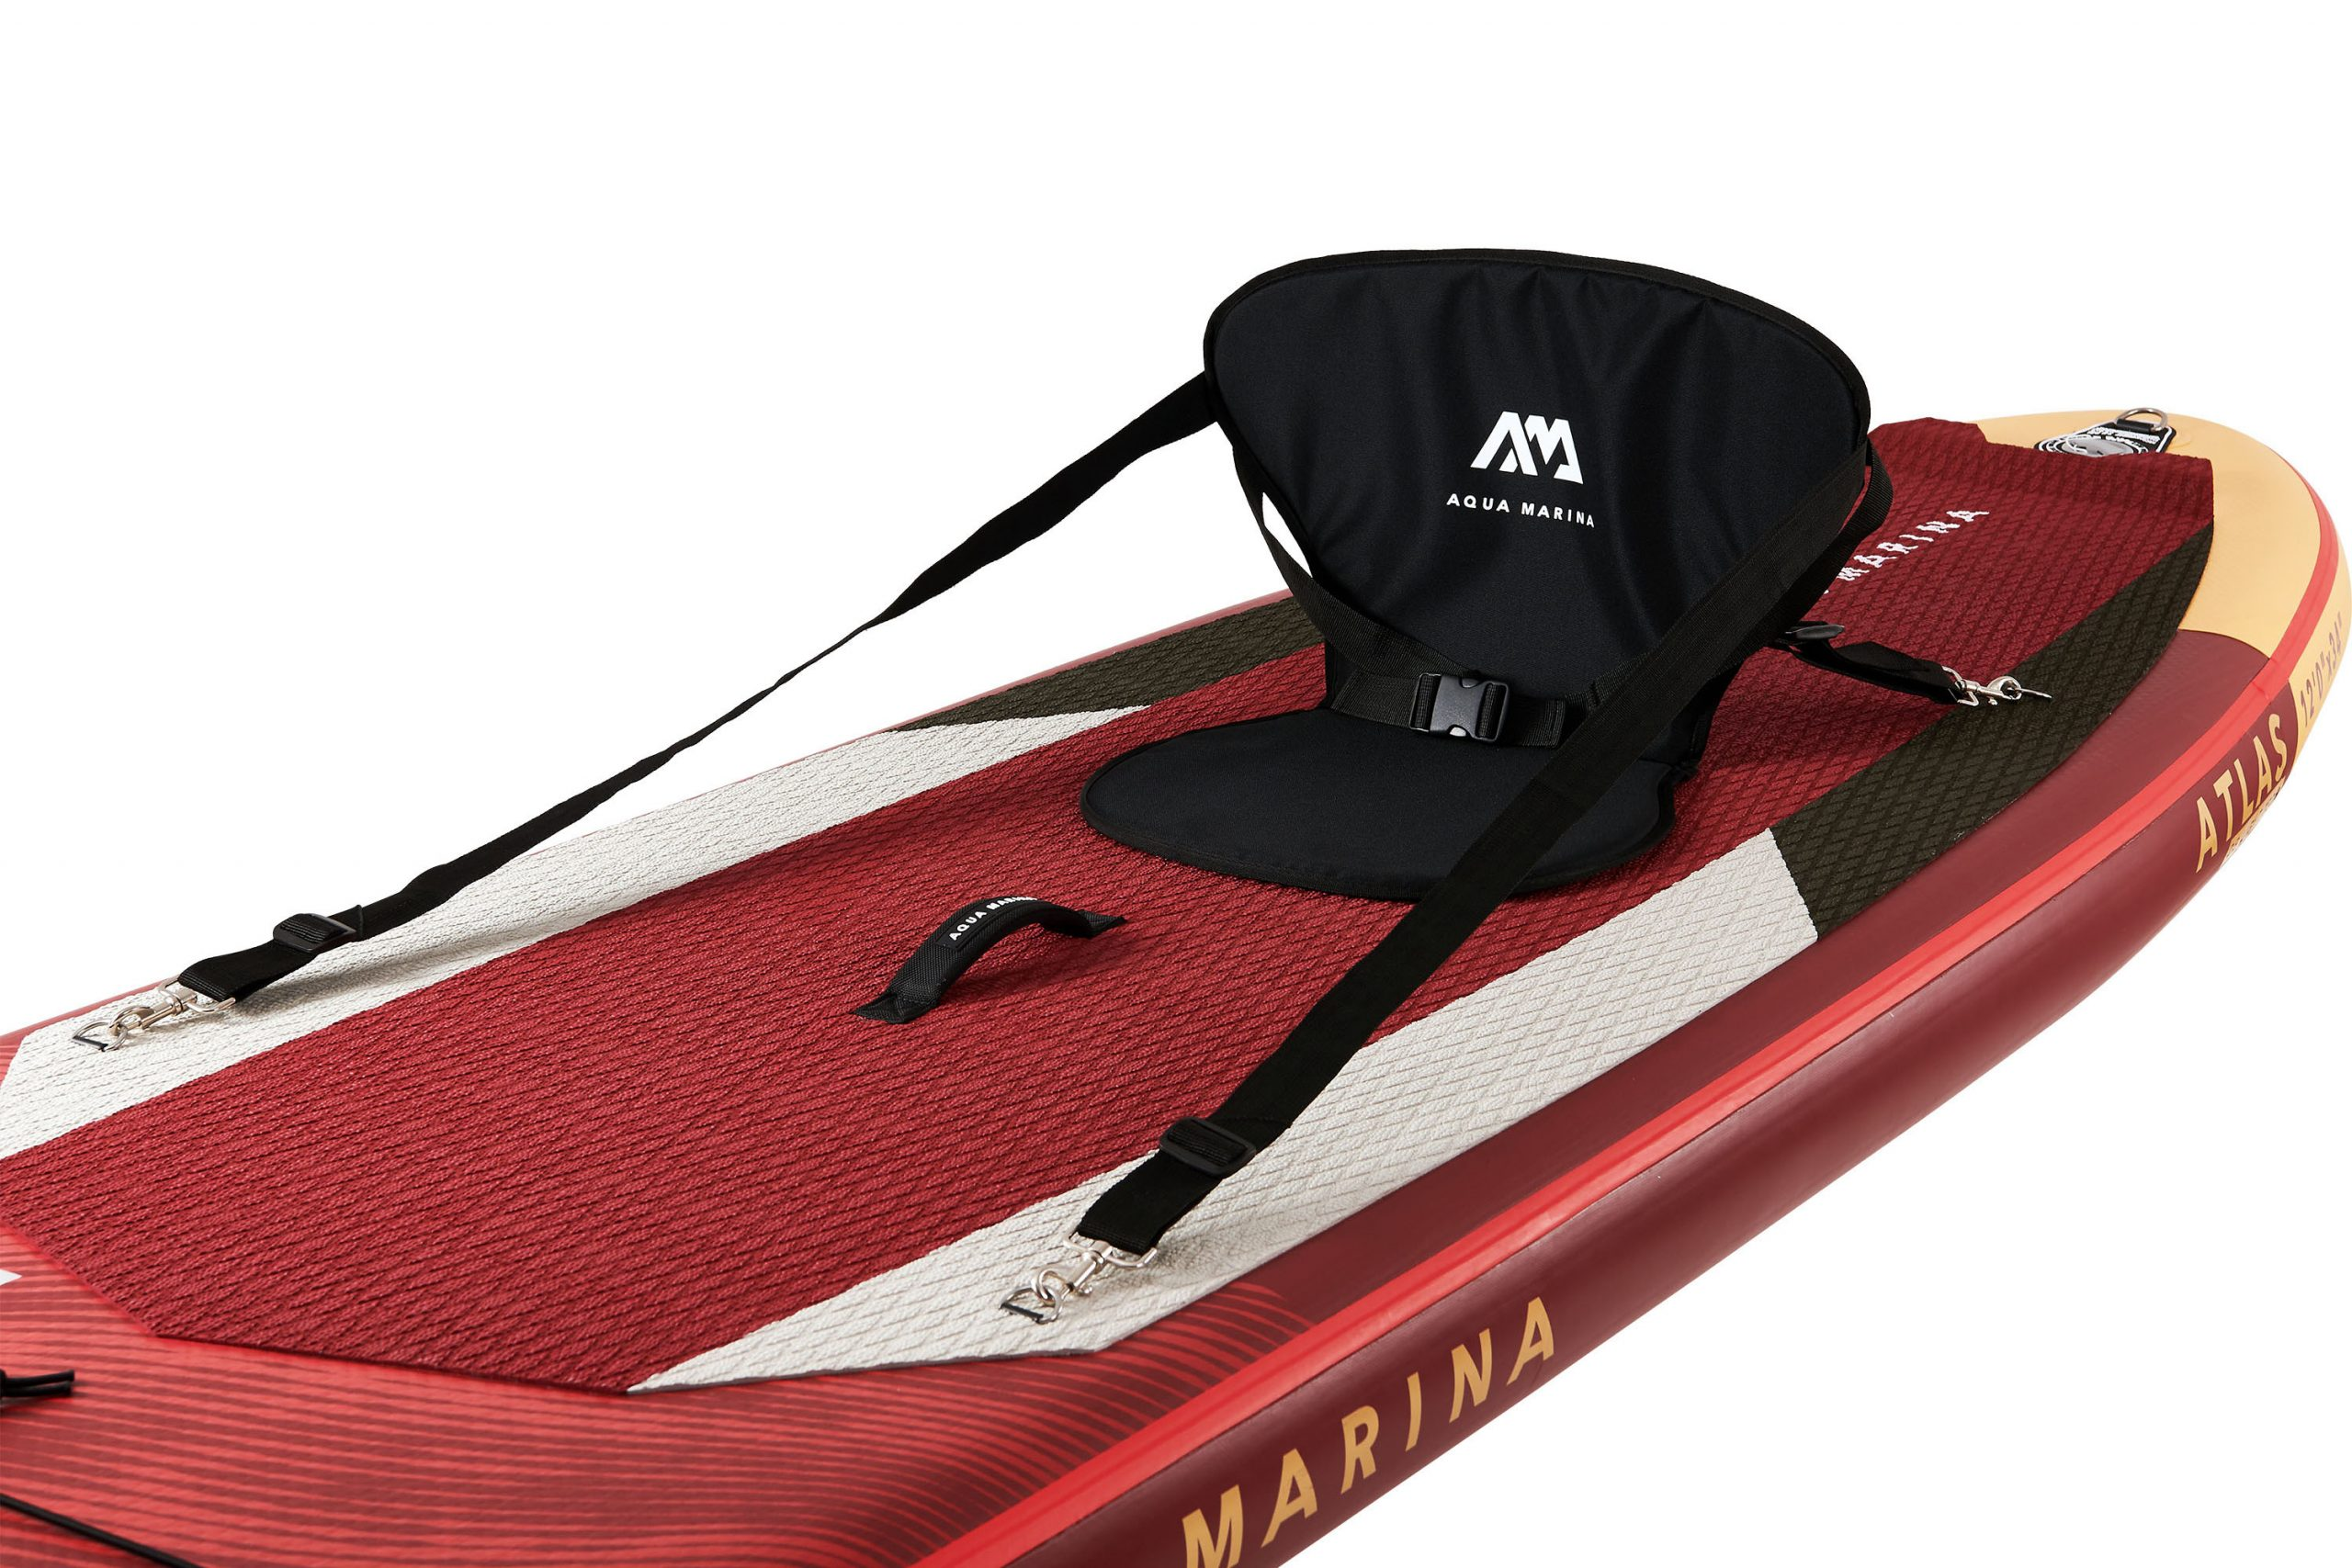 Sup Aqua Marina Adv. All Around Isupatlas | Bt 21atp